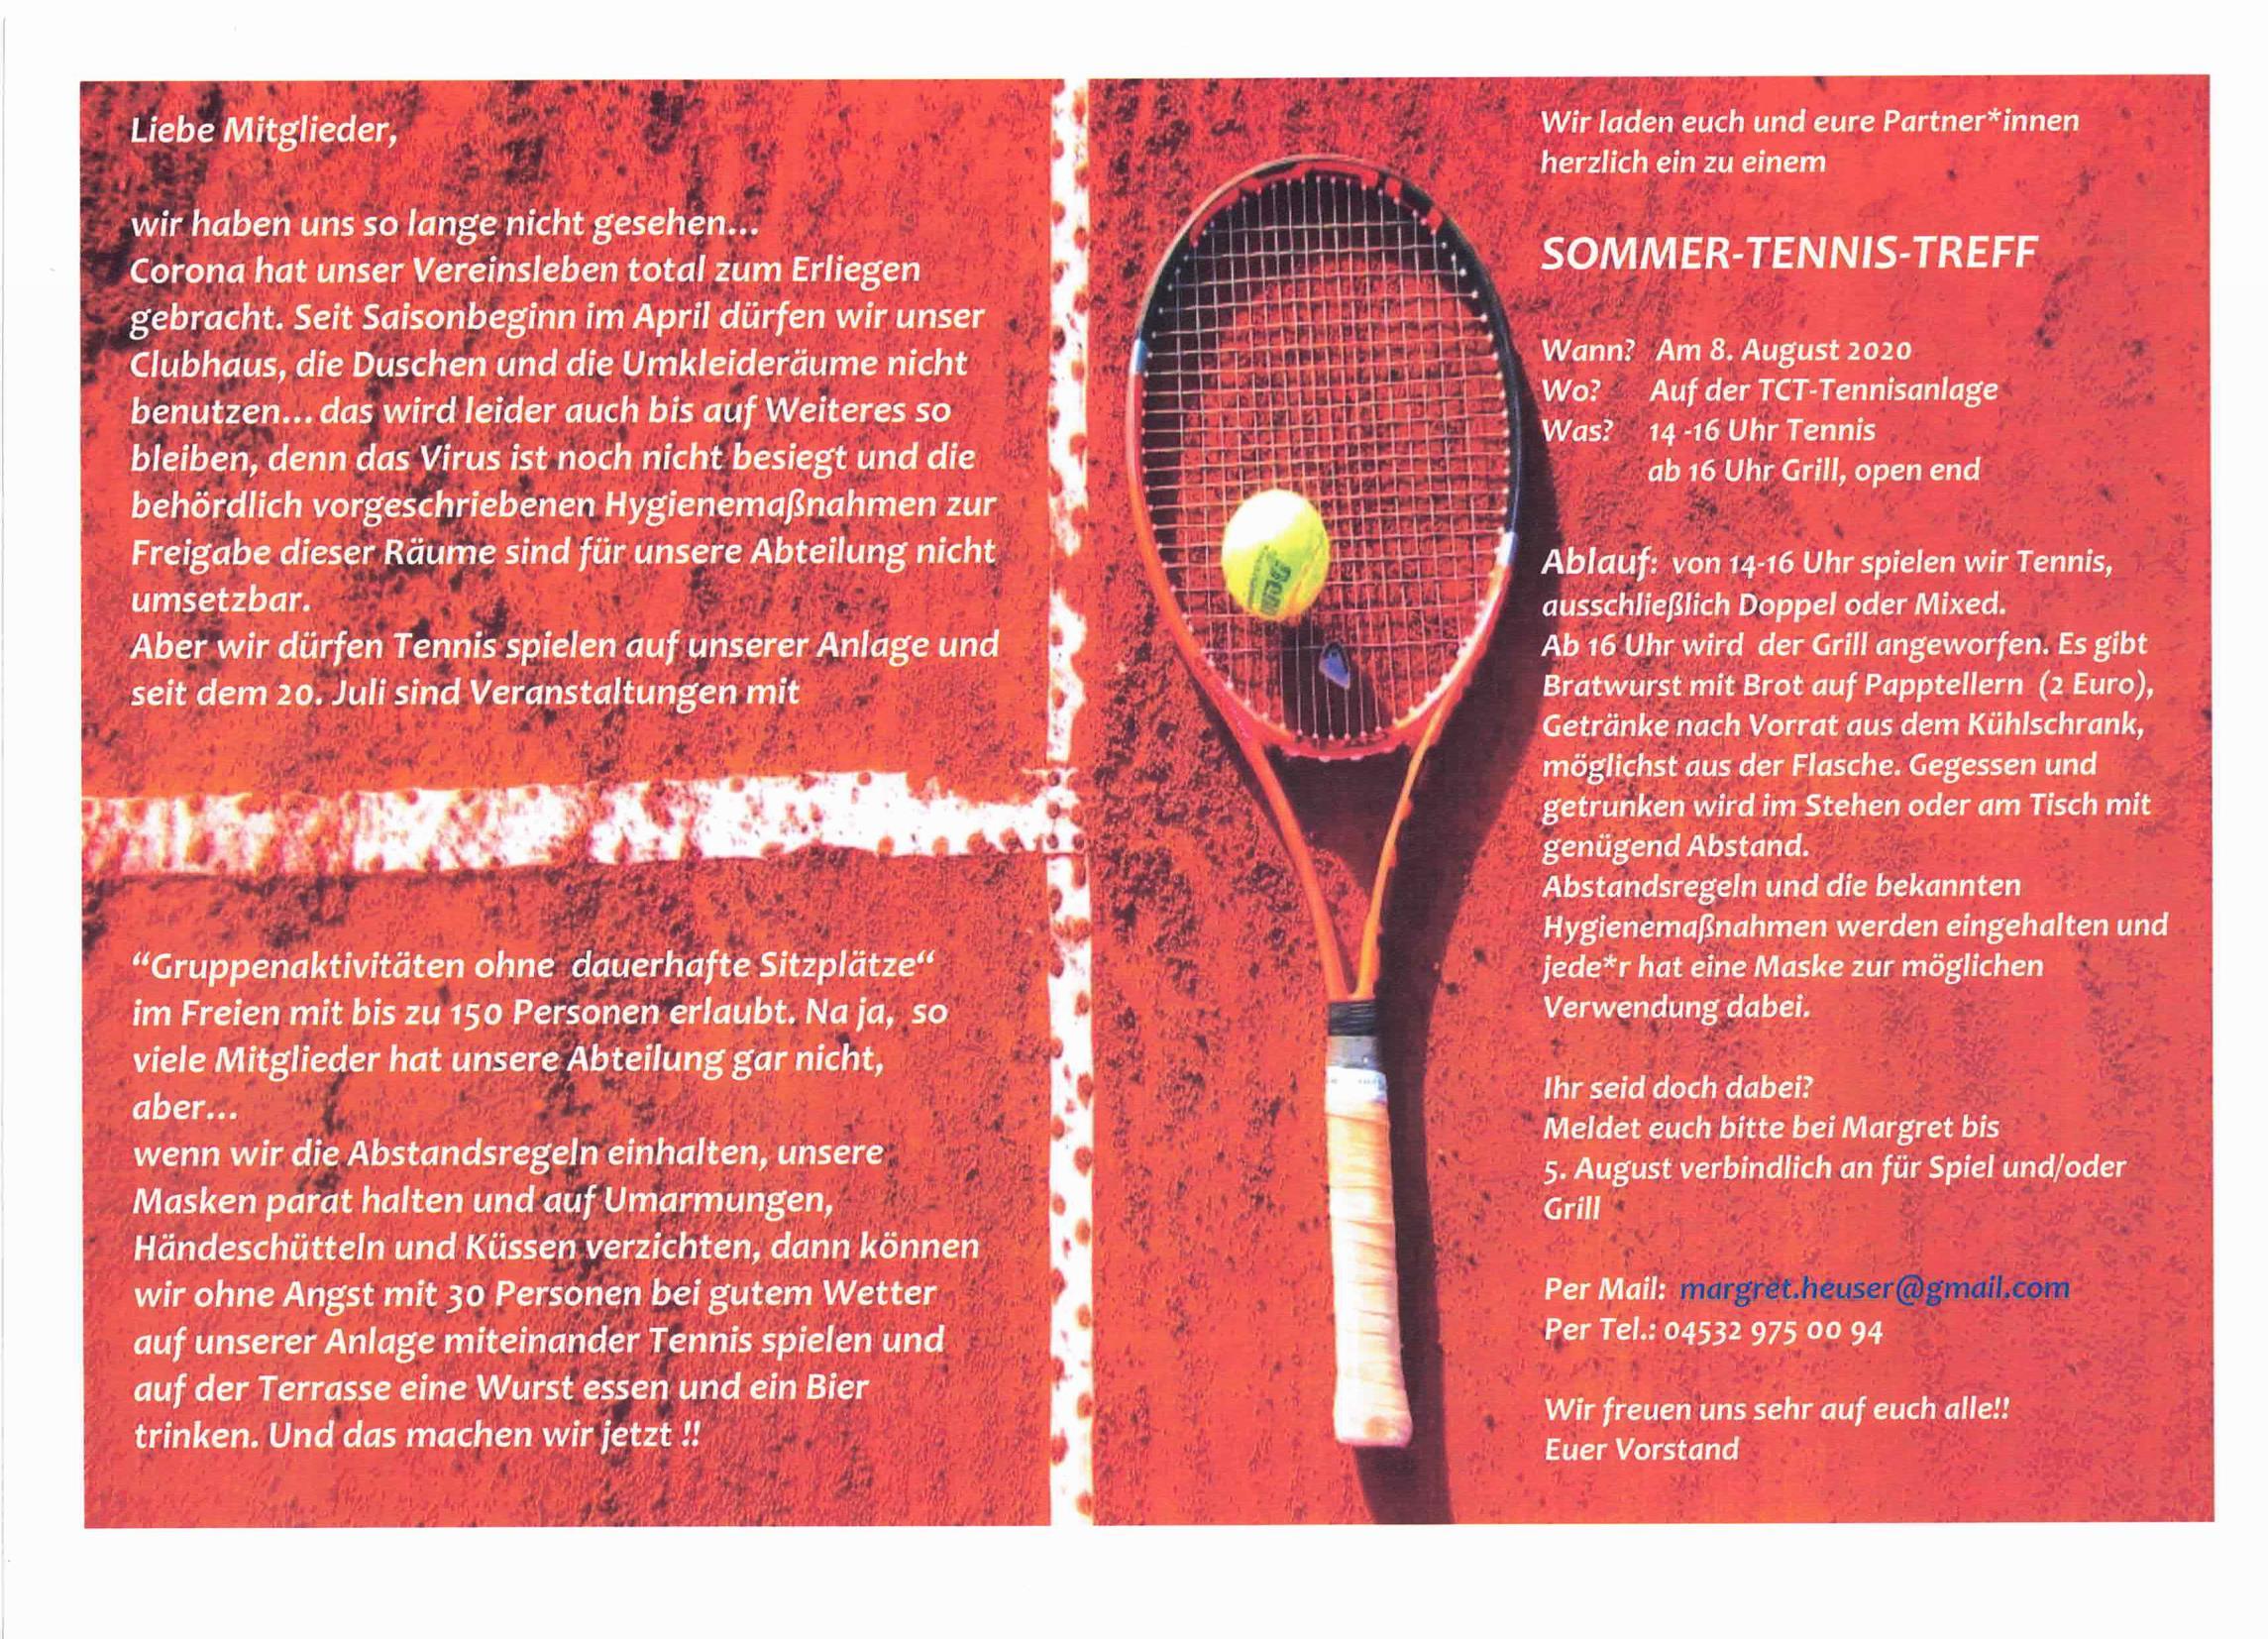 Sommer-Tennis-Treff PDF_Page_1